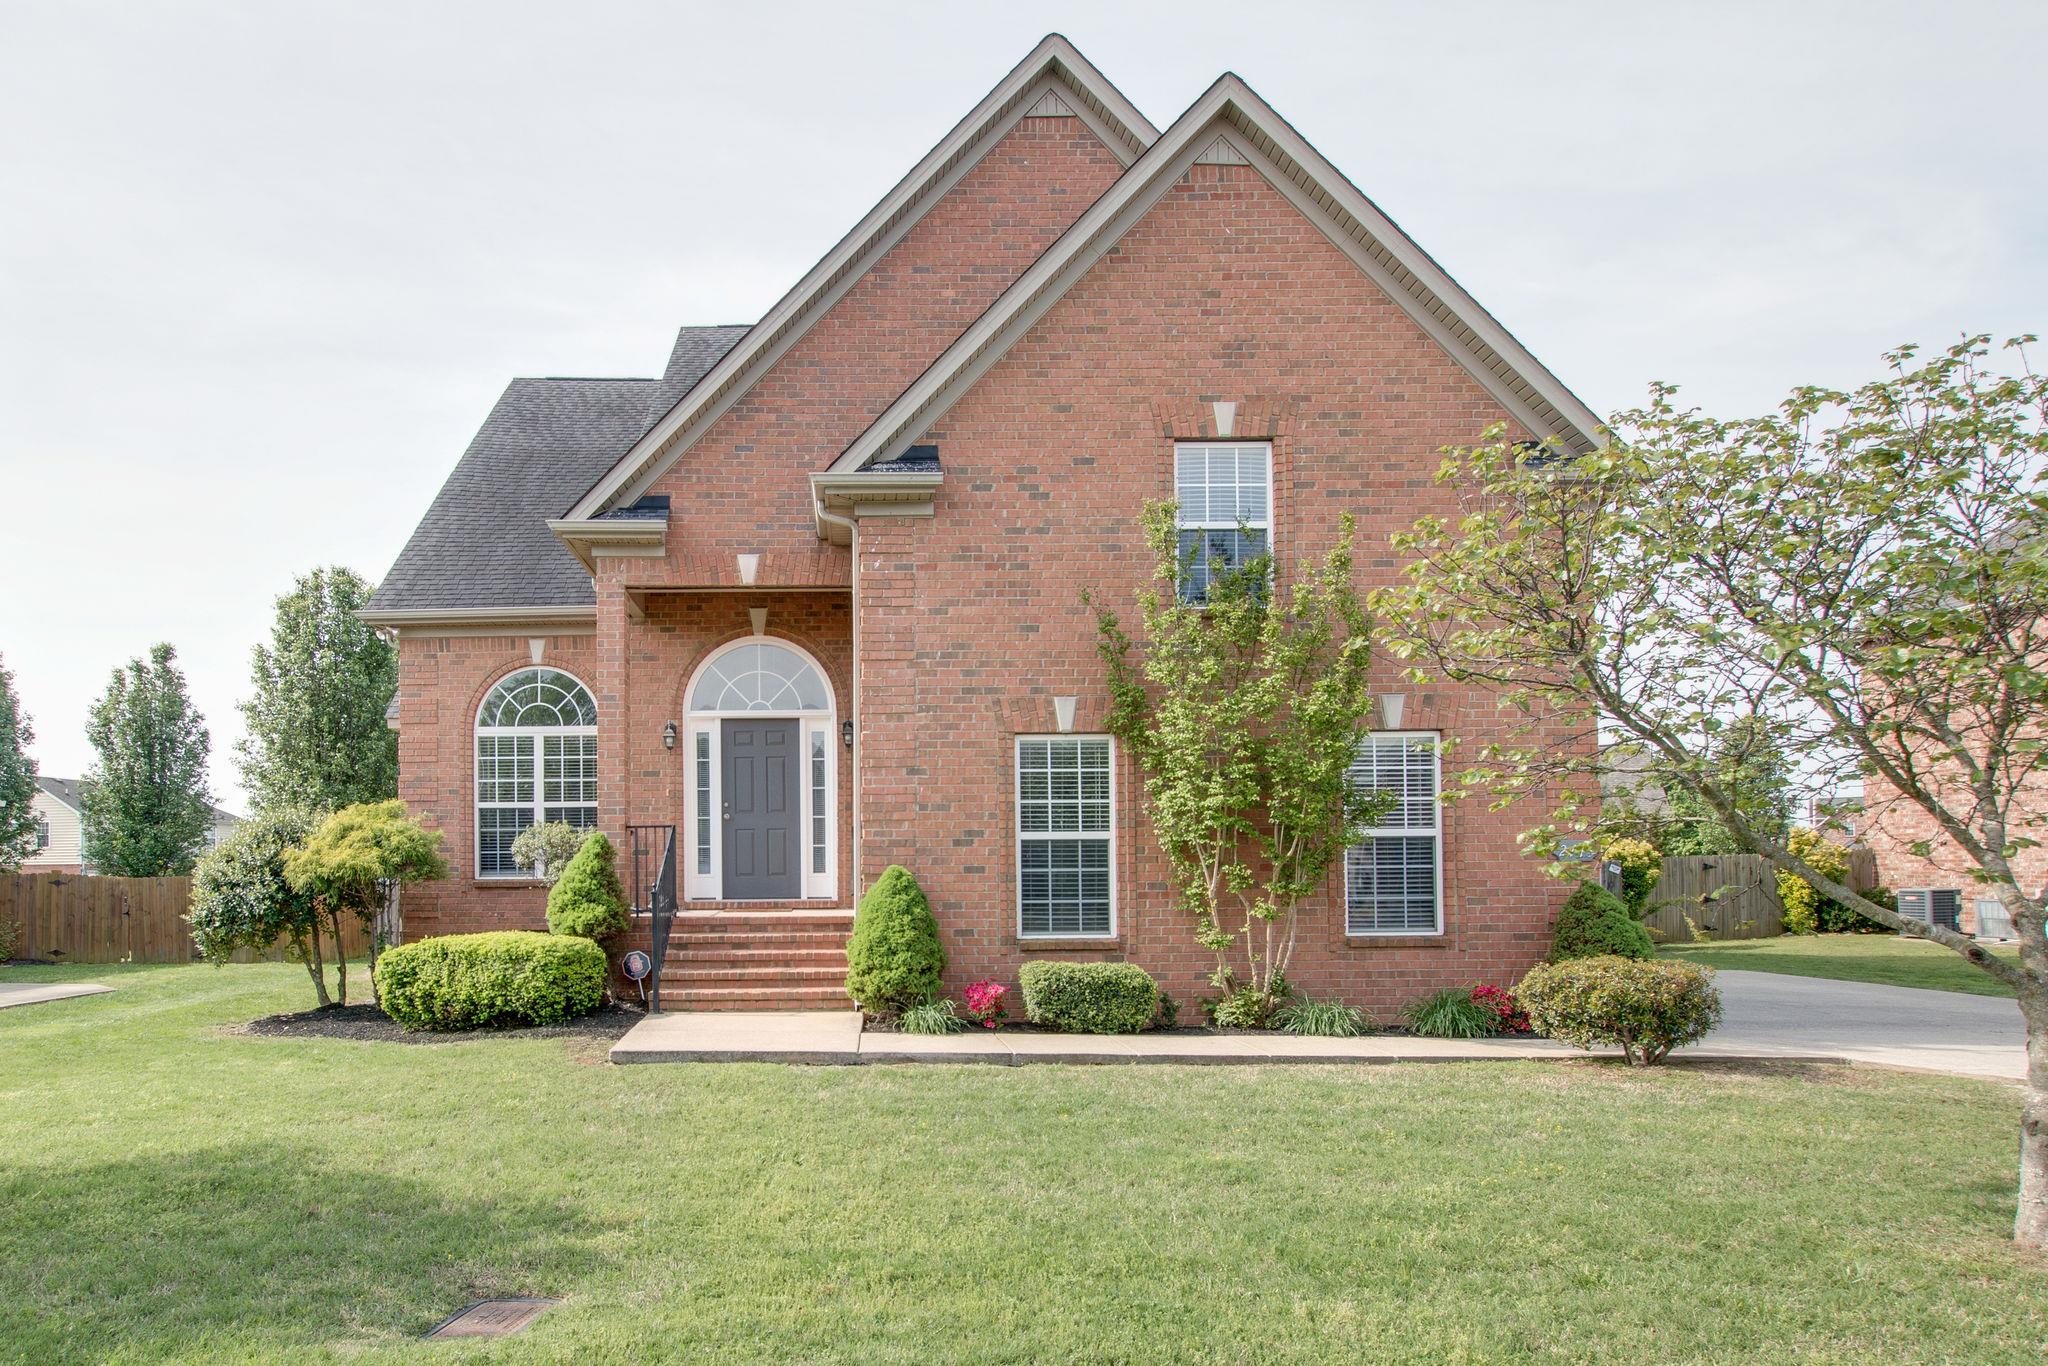 2743 Maylon Dr, Murfreesboro, TN 37128 - Murfreesboro, TN real estate listing